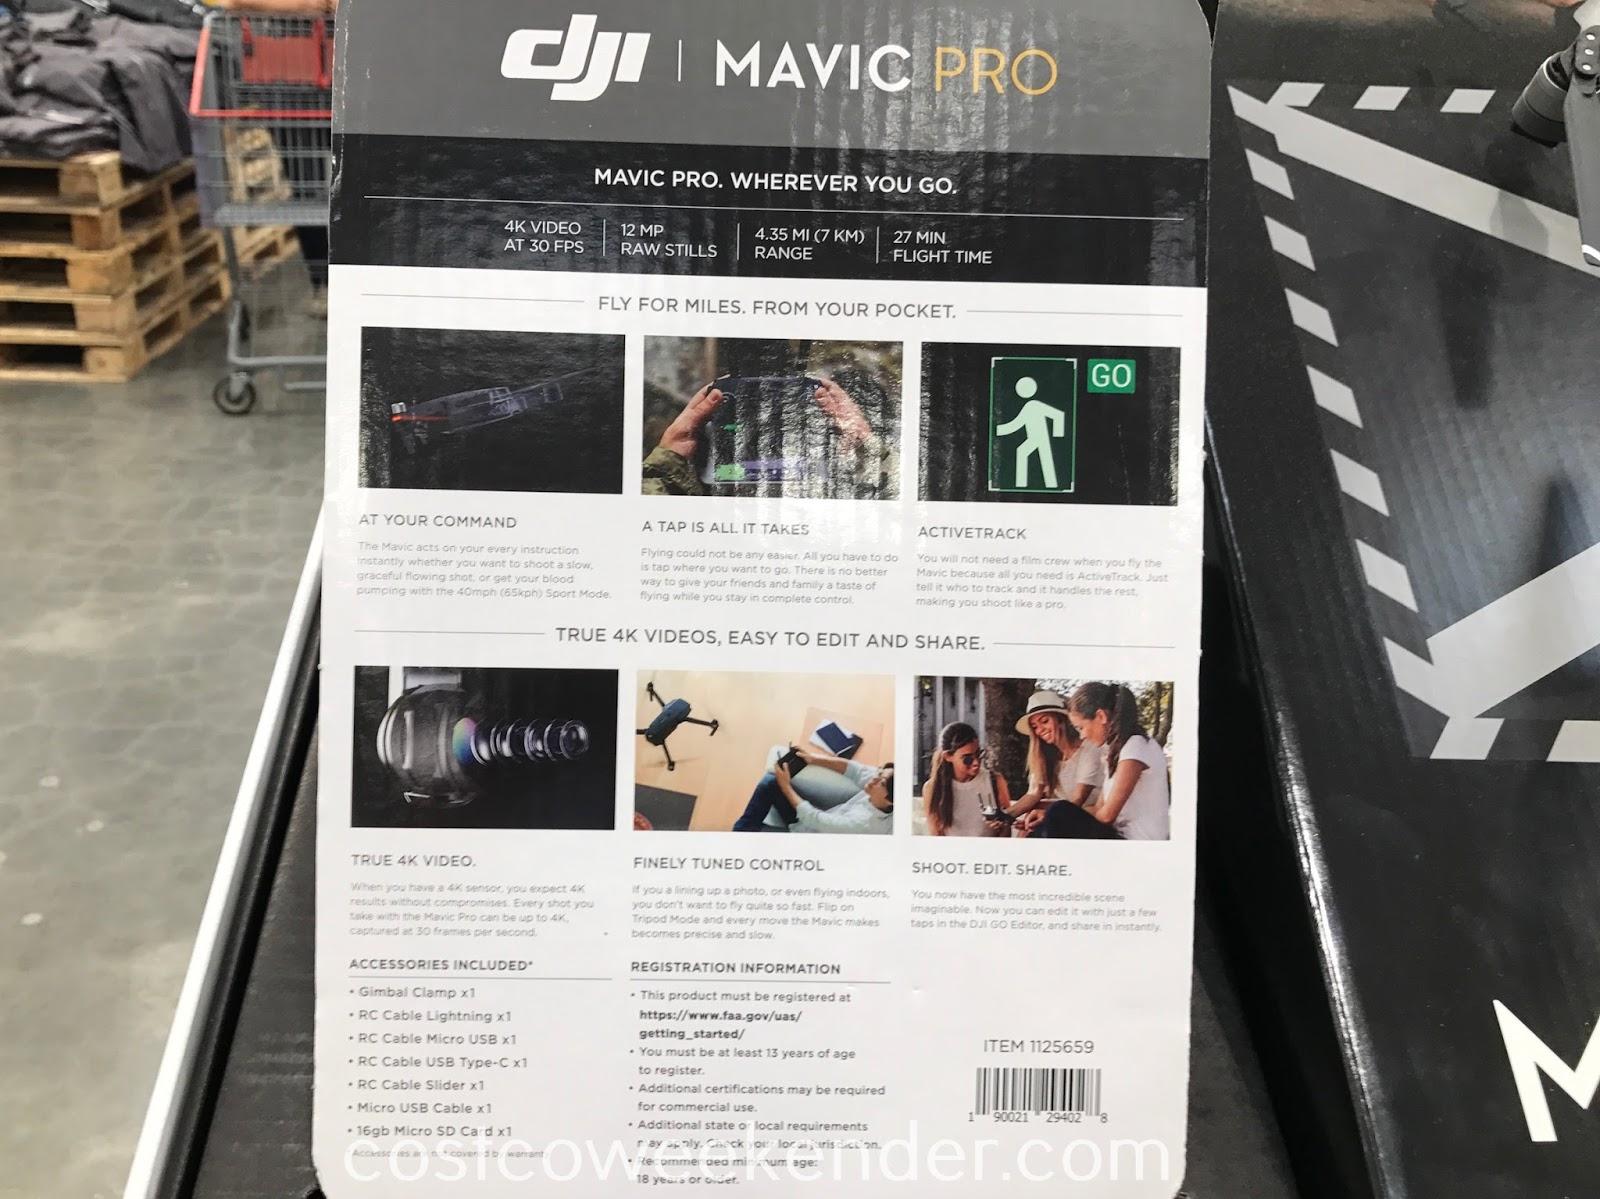 Costco 1125659 - Get a bird's eye view with the DJI Mavic Pro drone